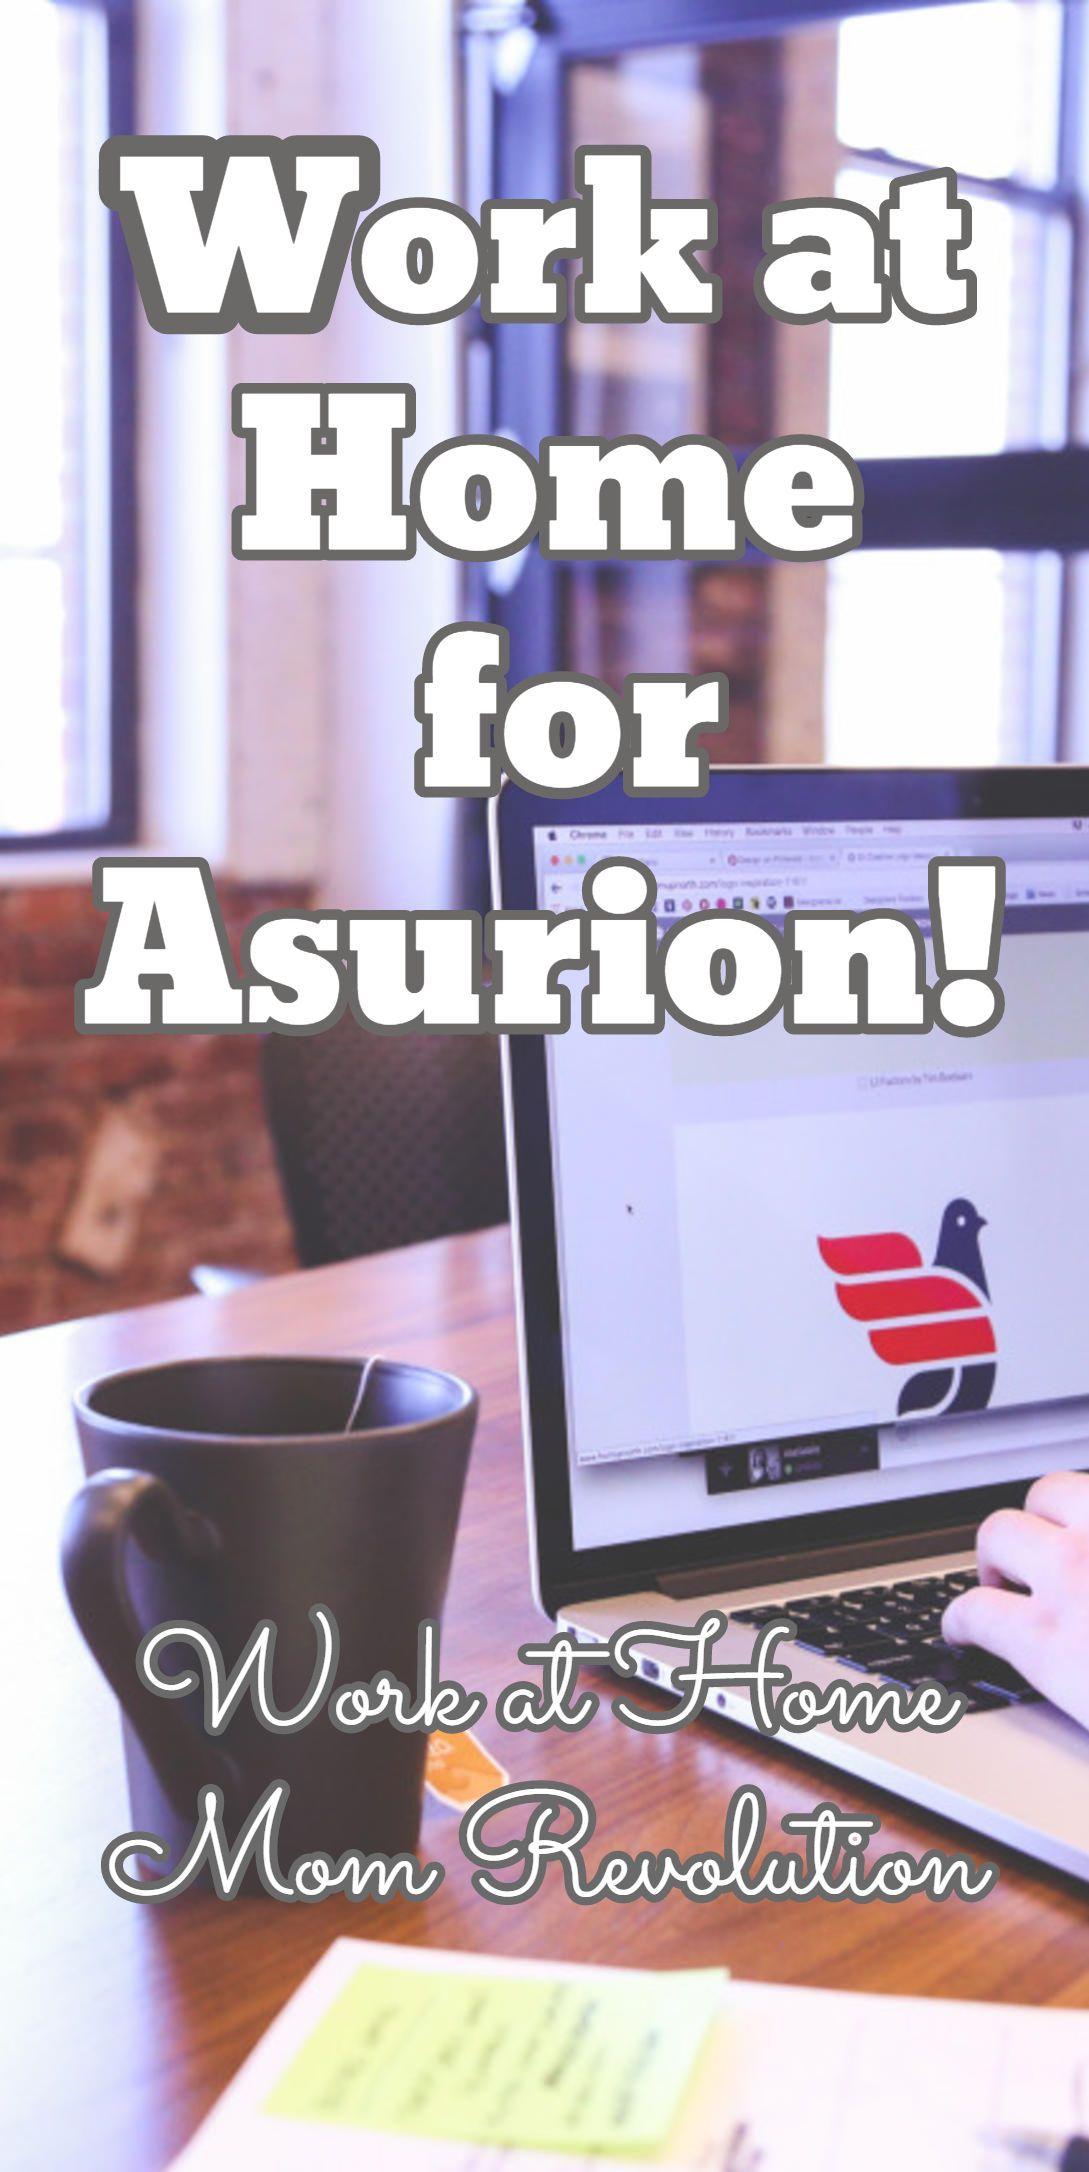 Work at Home for Asurion! / Work at Home Mom Revolution